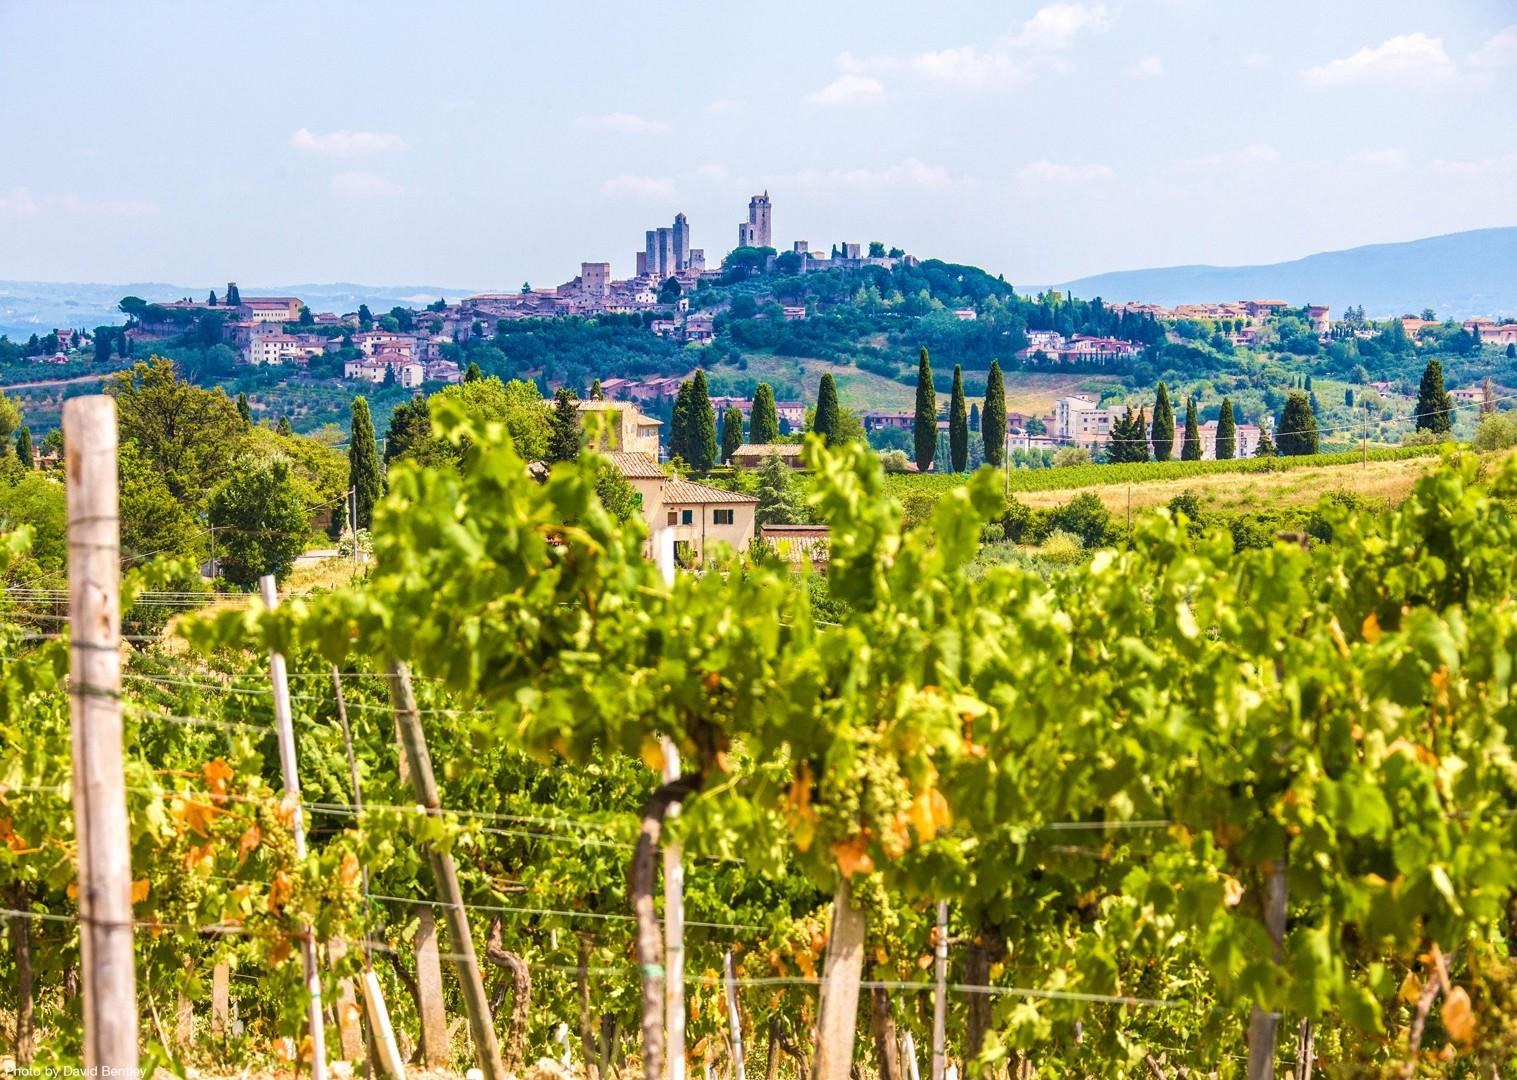 0018 Day 2 San Gimignano.jpg - Italy - Tuscany - Giro della Toscana - Guided Road Cycling Holiday - Road Cycling